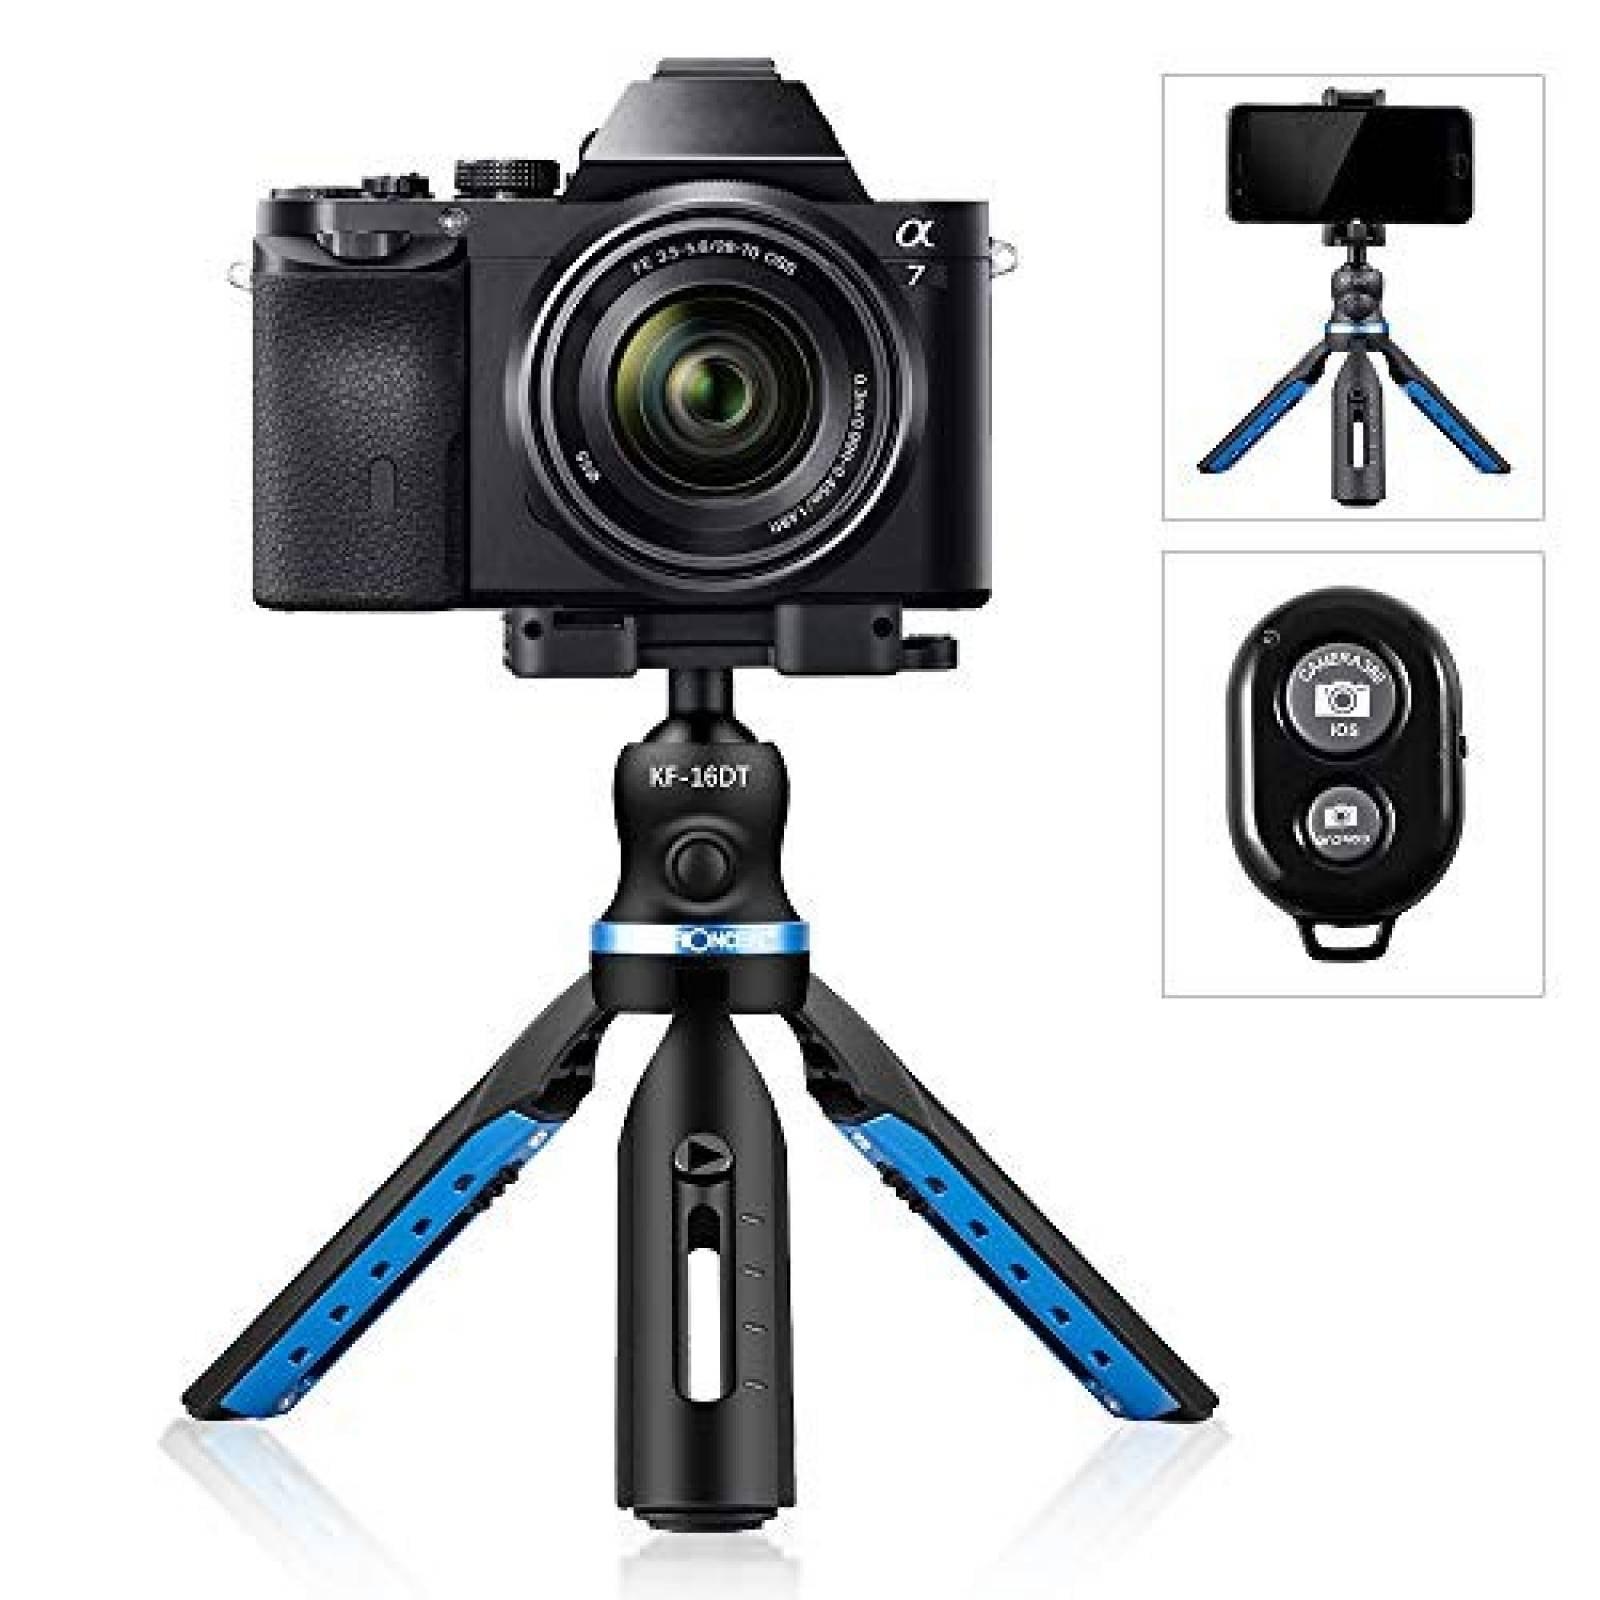 Mini trípode K&FConcept smartphone GoPro webcam -negro